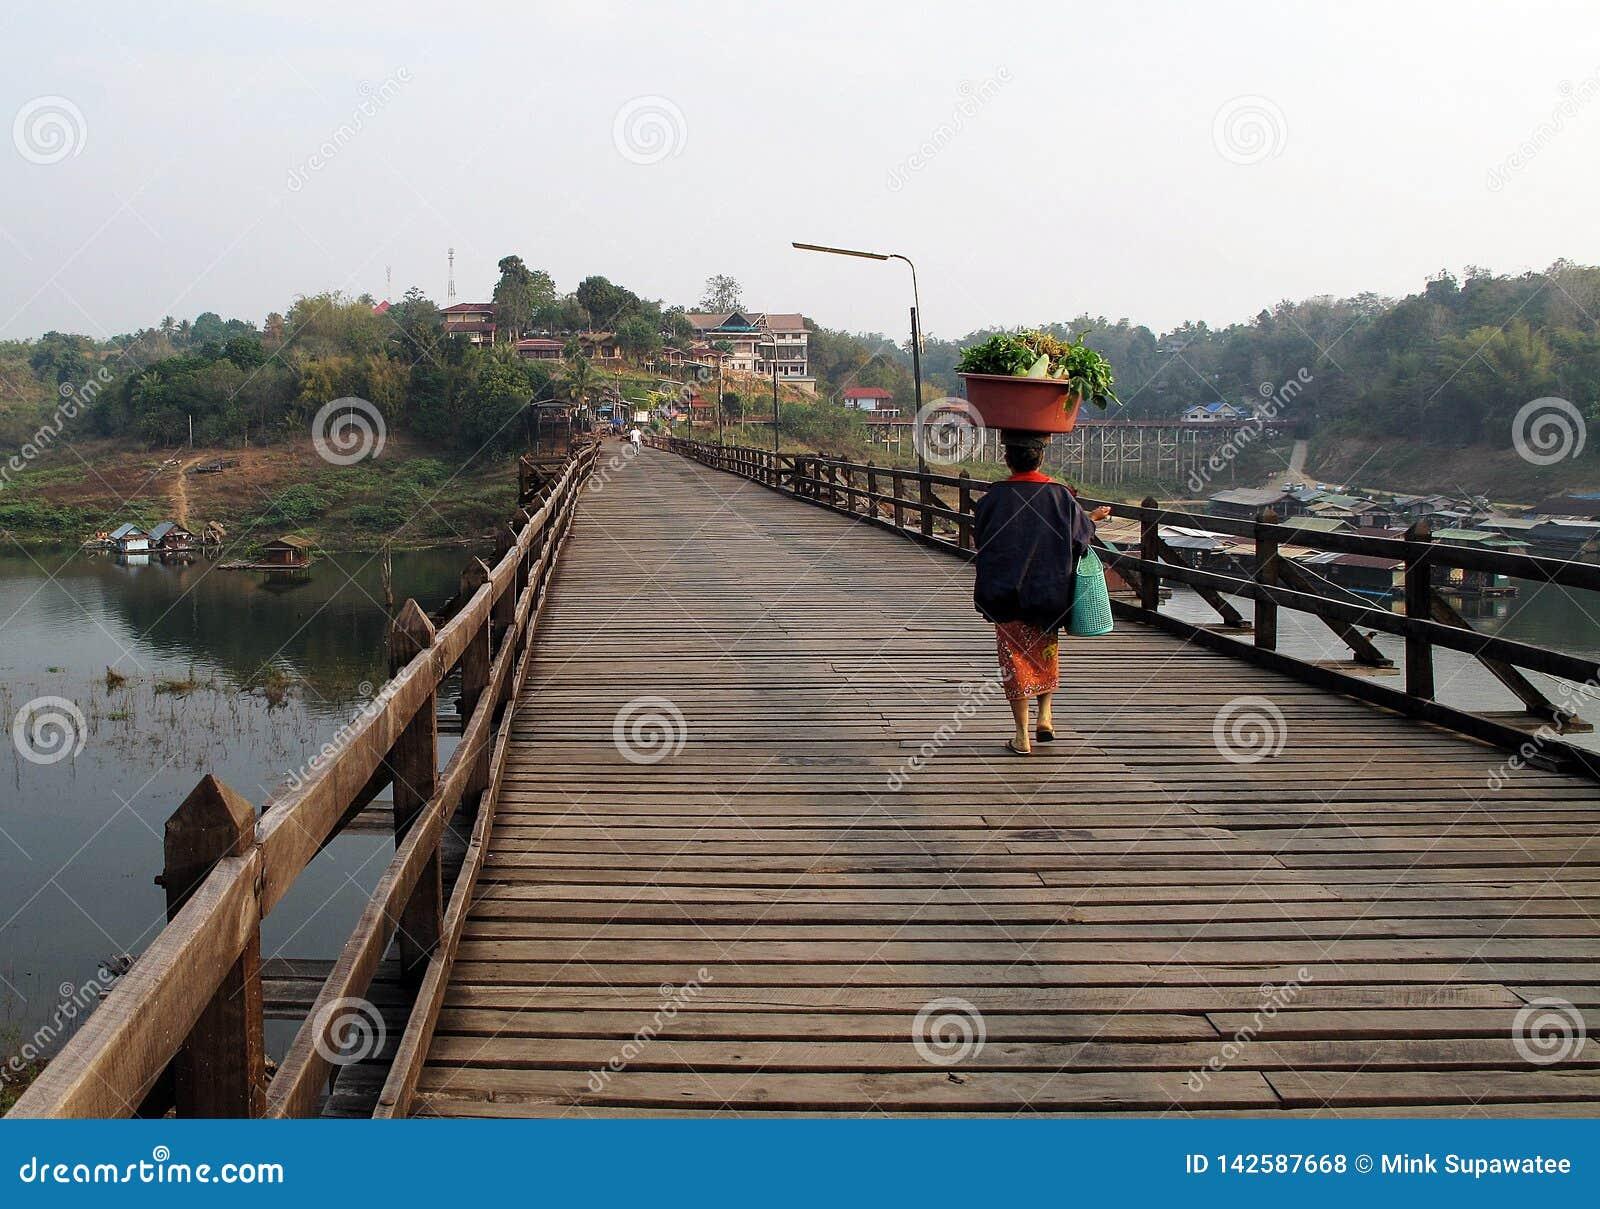 im looking some good head in bridge